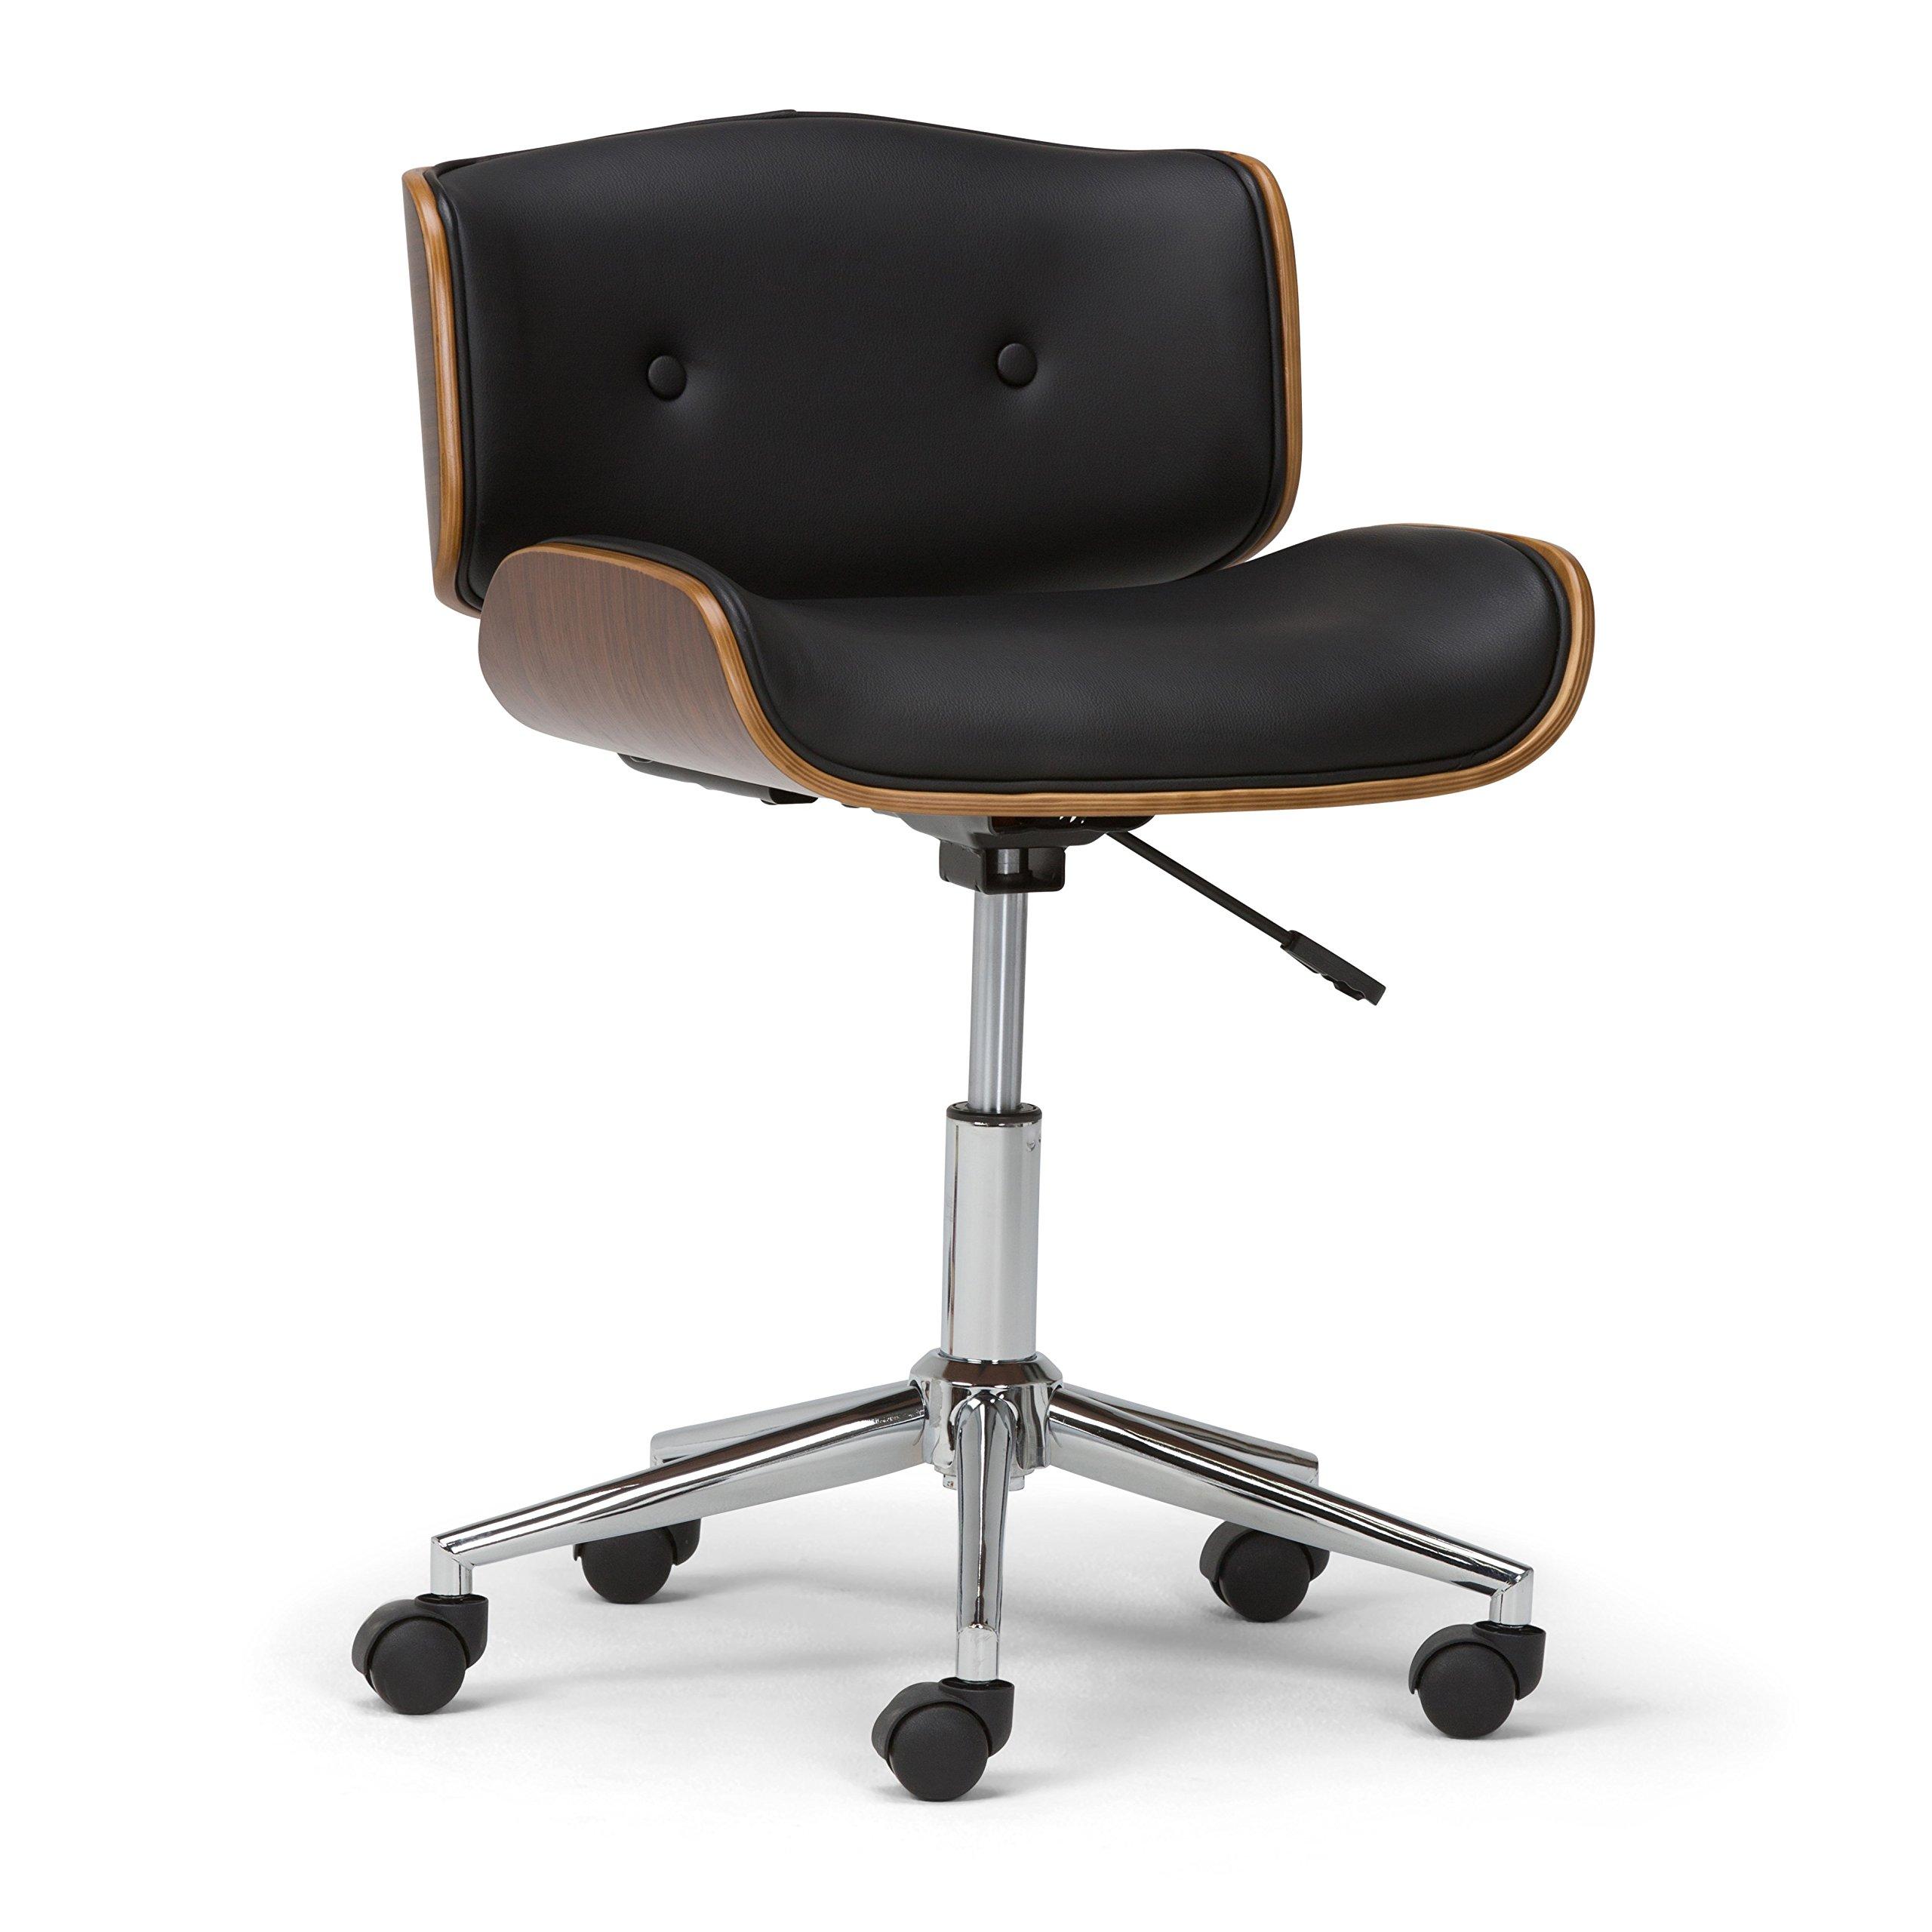 Simpli Home Dax Bentwood Office Chair, Black